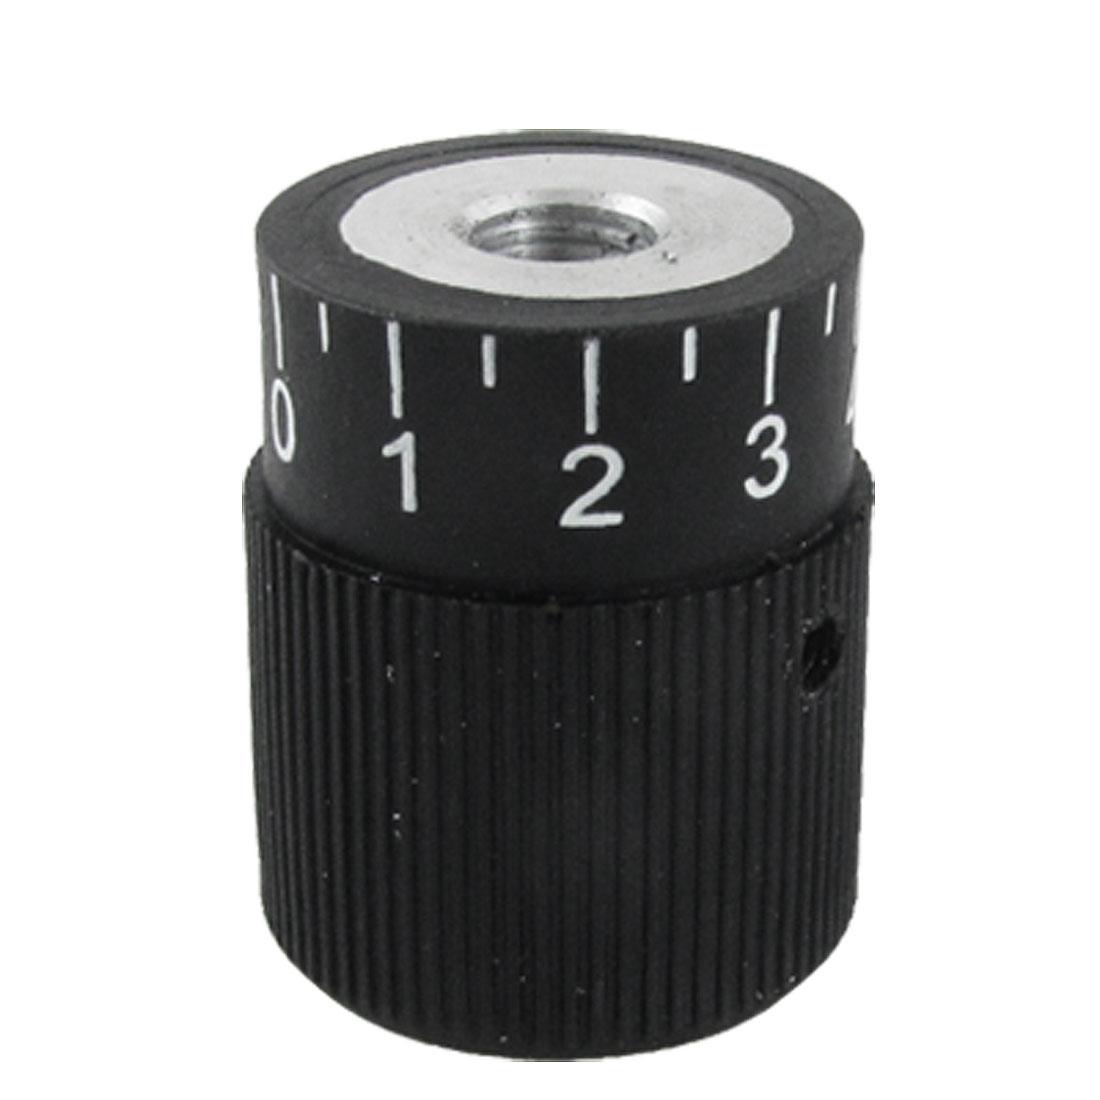 Mechanical 10mm Hole Diameter Scale Knurled Grip Graduation Knob